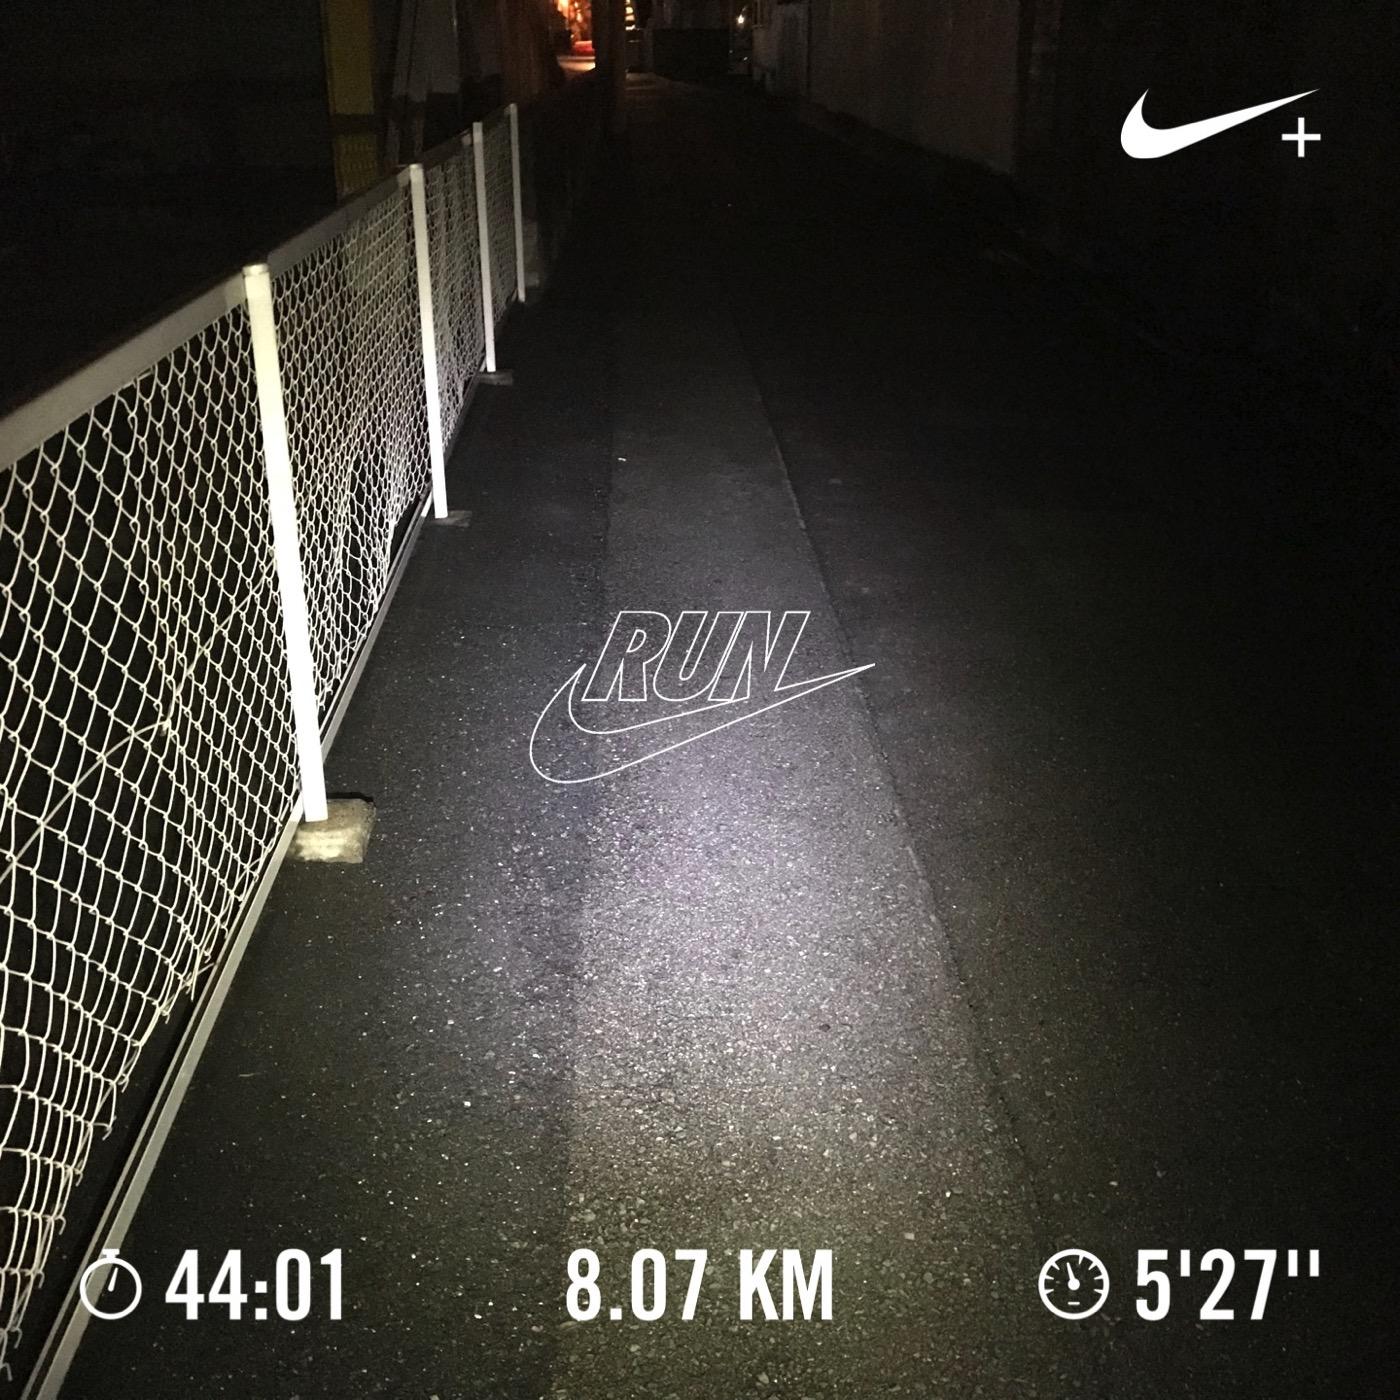 [Amazon]夜明け前の朝ランに「ReUdo ランニングライト 軽量ウエストベルトタイプ」で走ってみたらとても快適だったよ